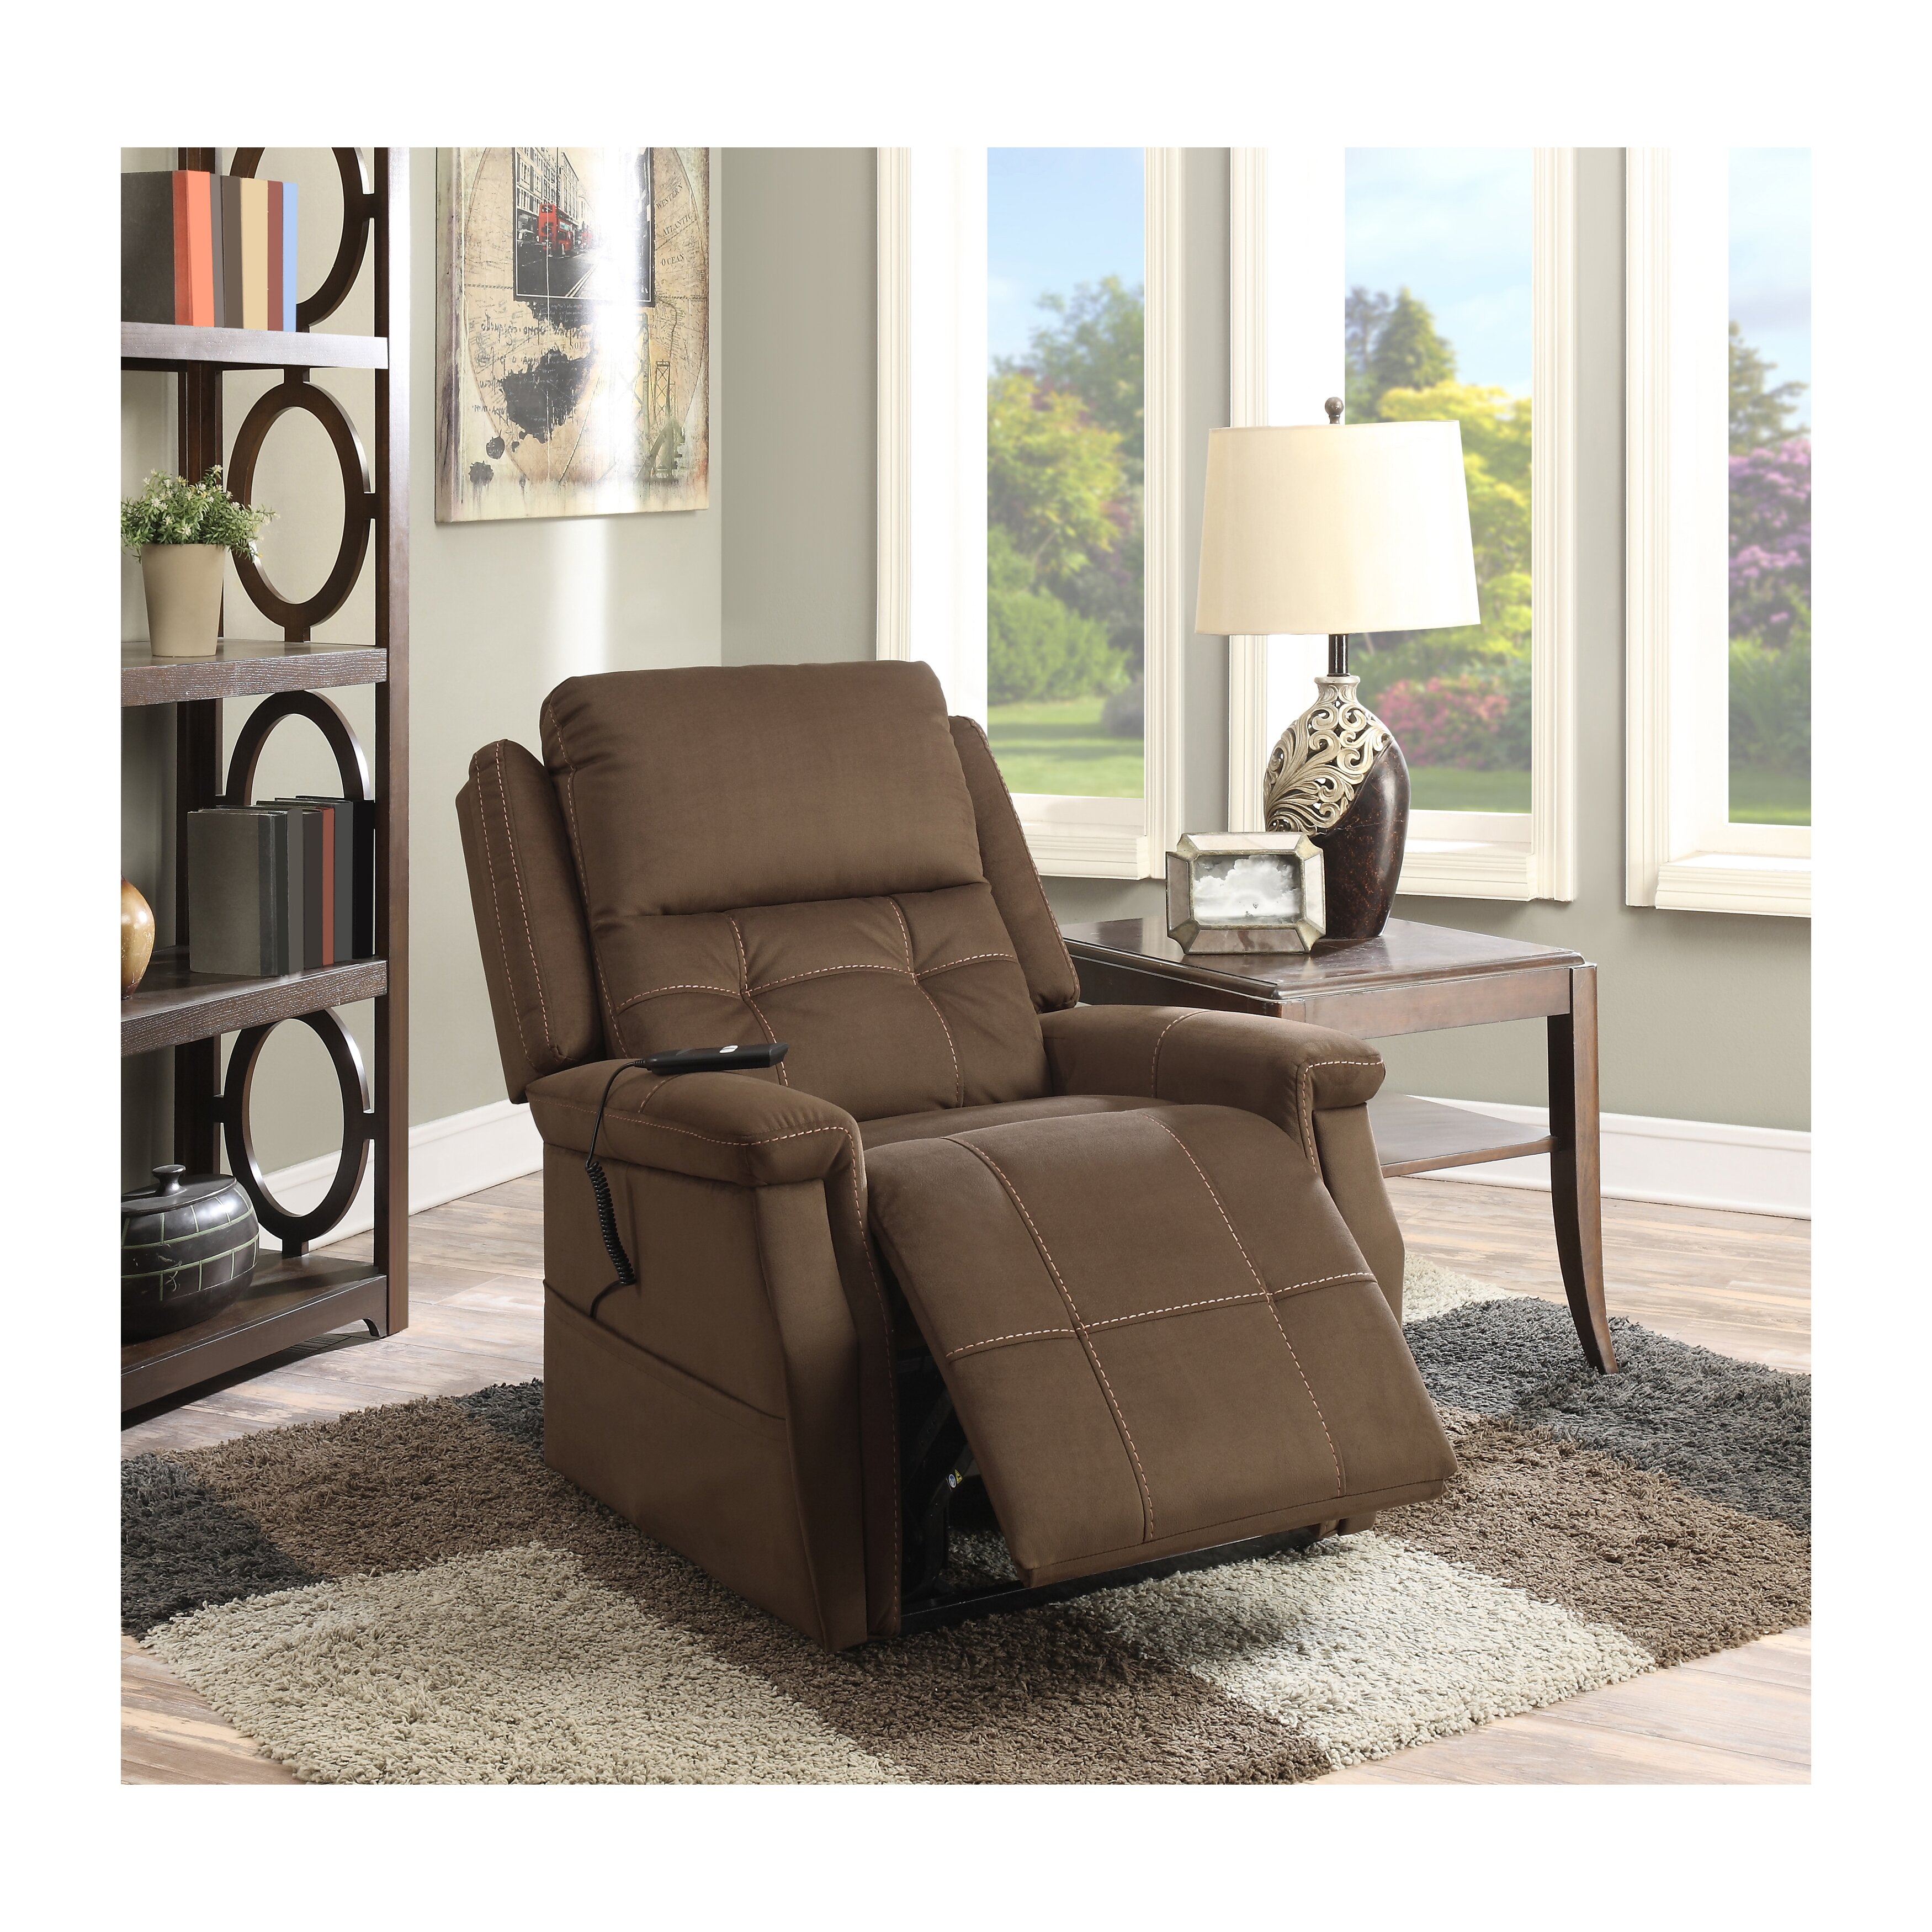 Pulaski Living Room Furniture Pulaski Double Motor Infinite Positions Lift Chair Reviews Wayfair